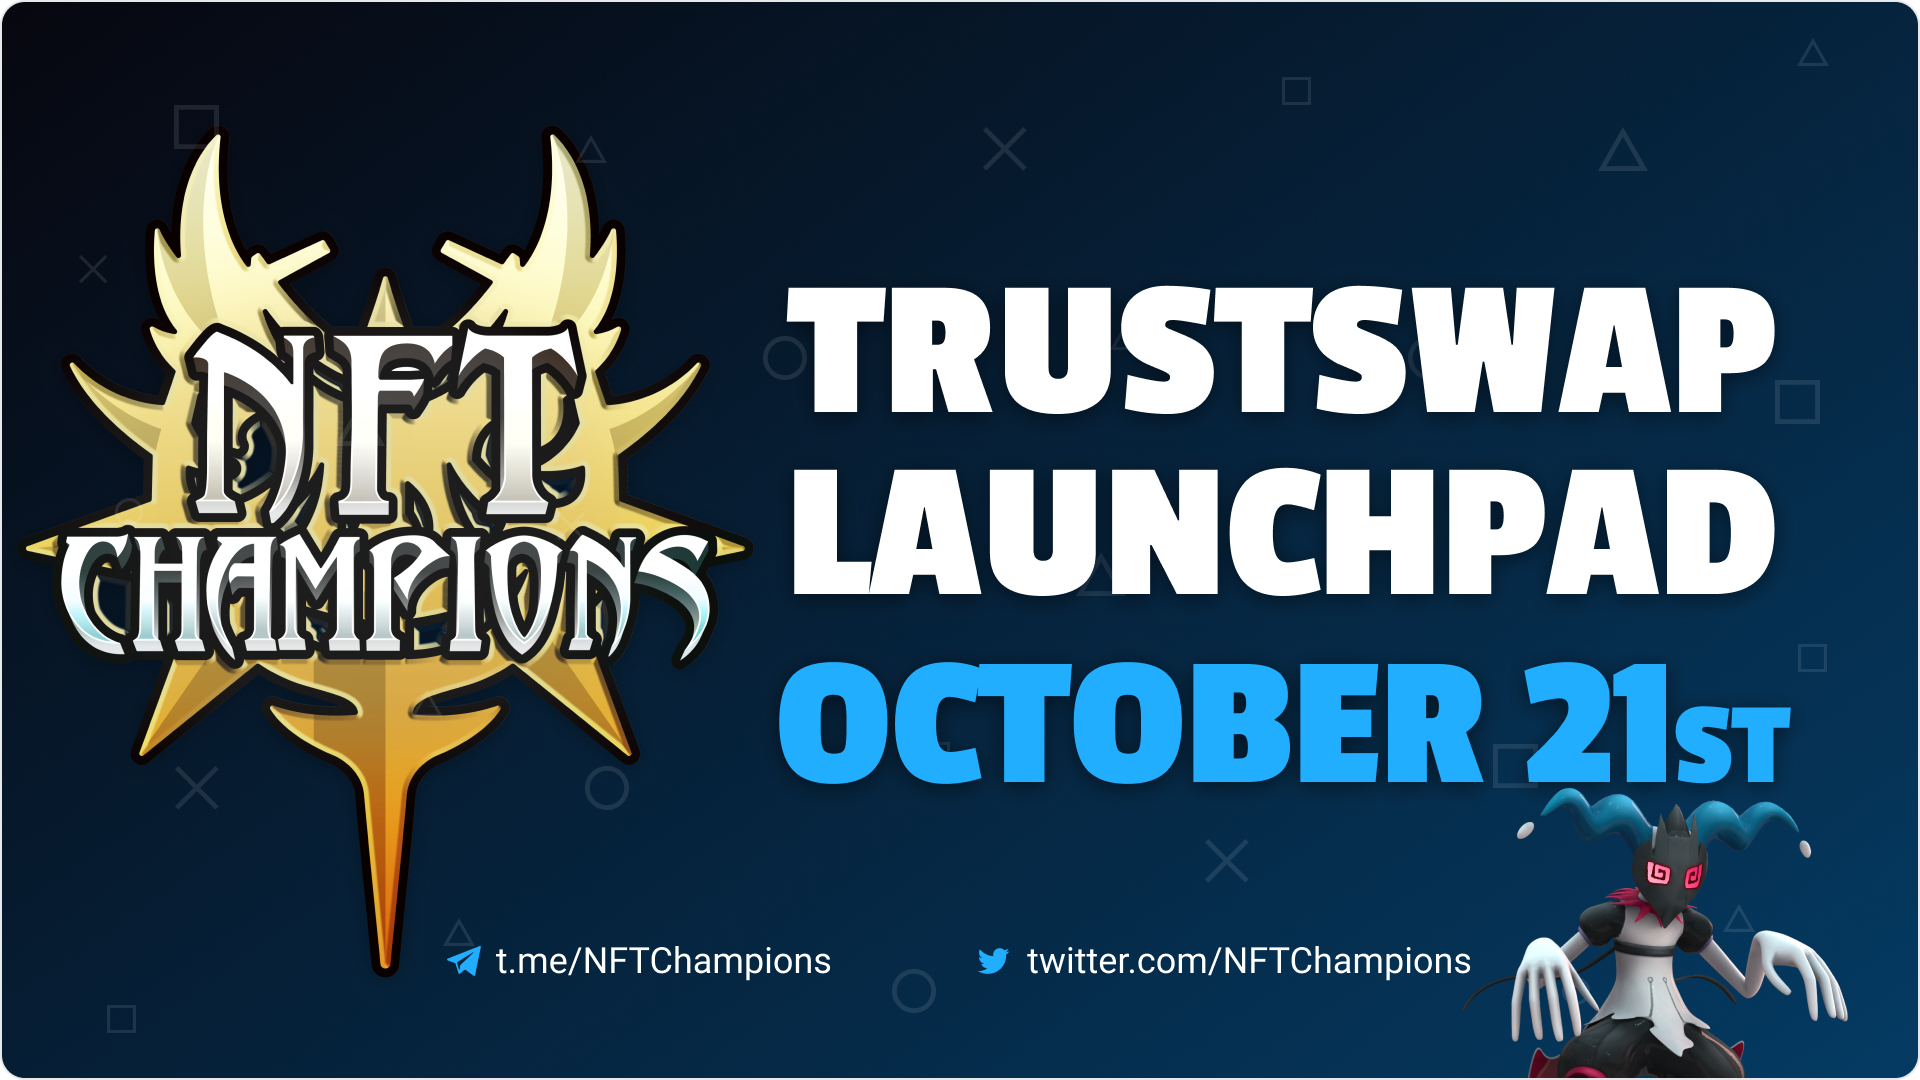 NFT Champions Announces October 21st Token Sale on TrustSwap Launchpad